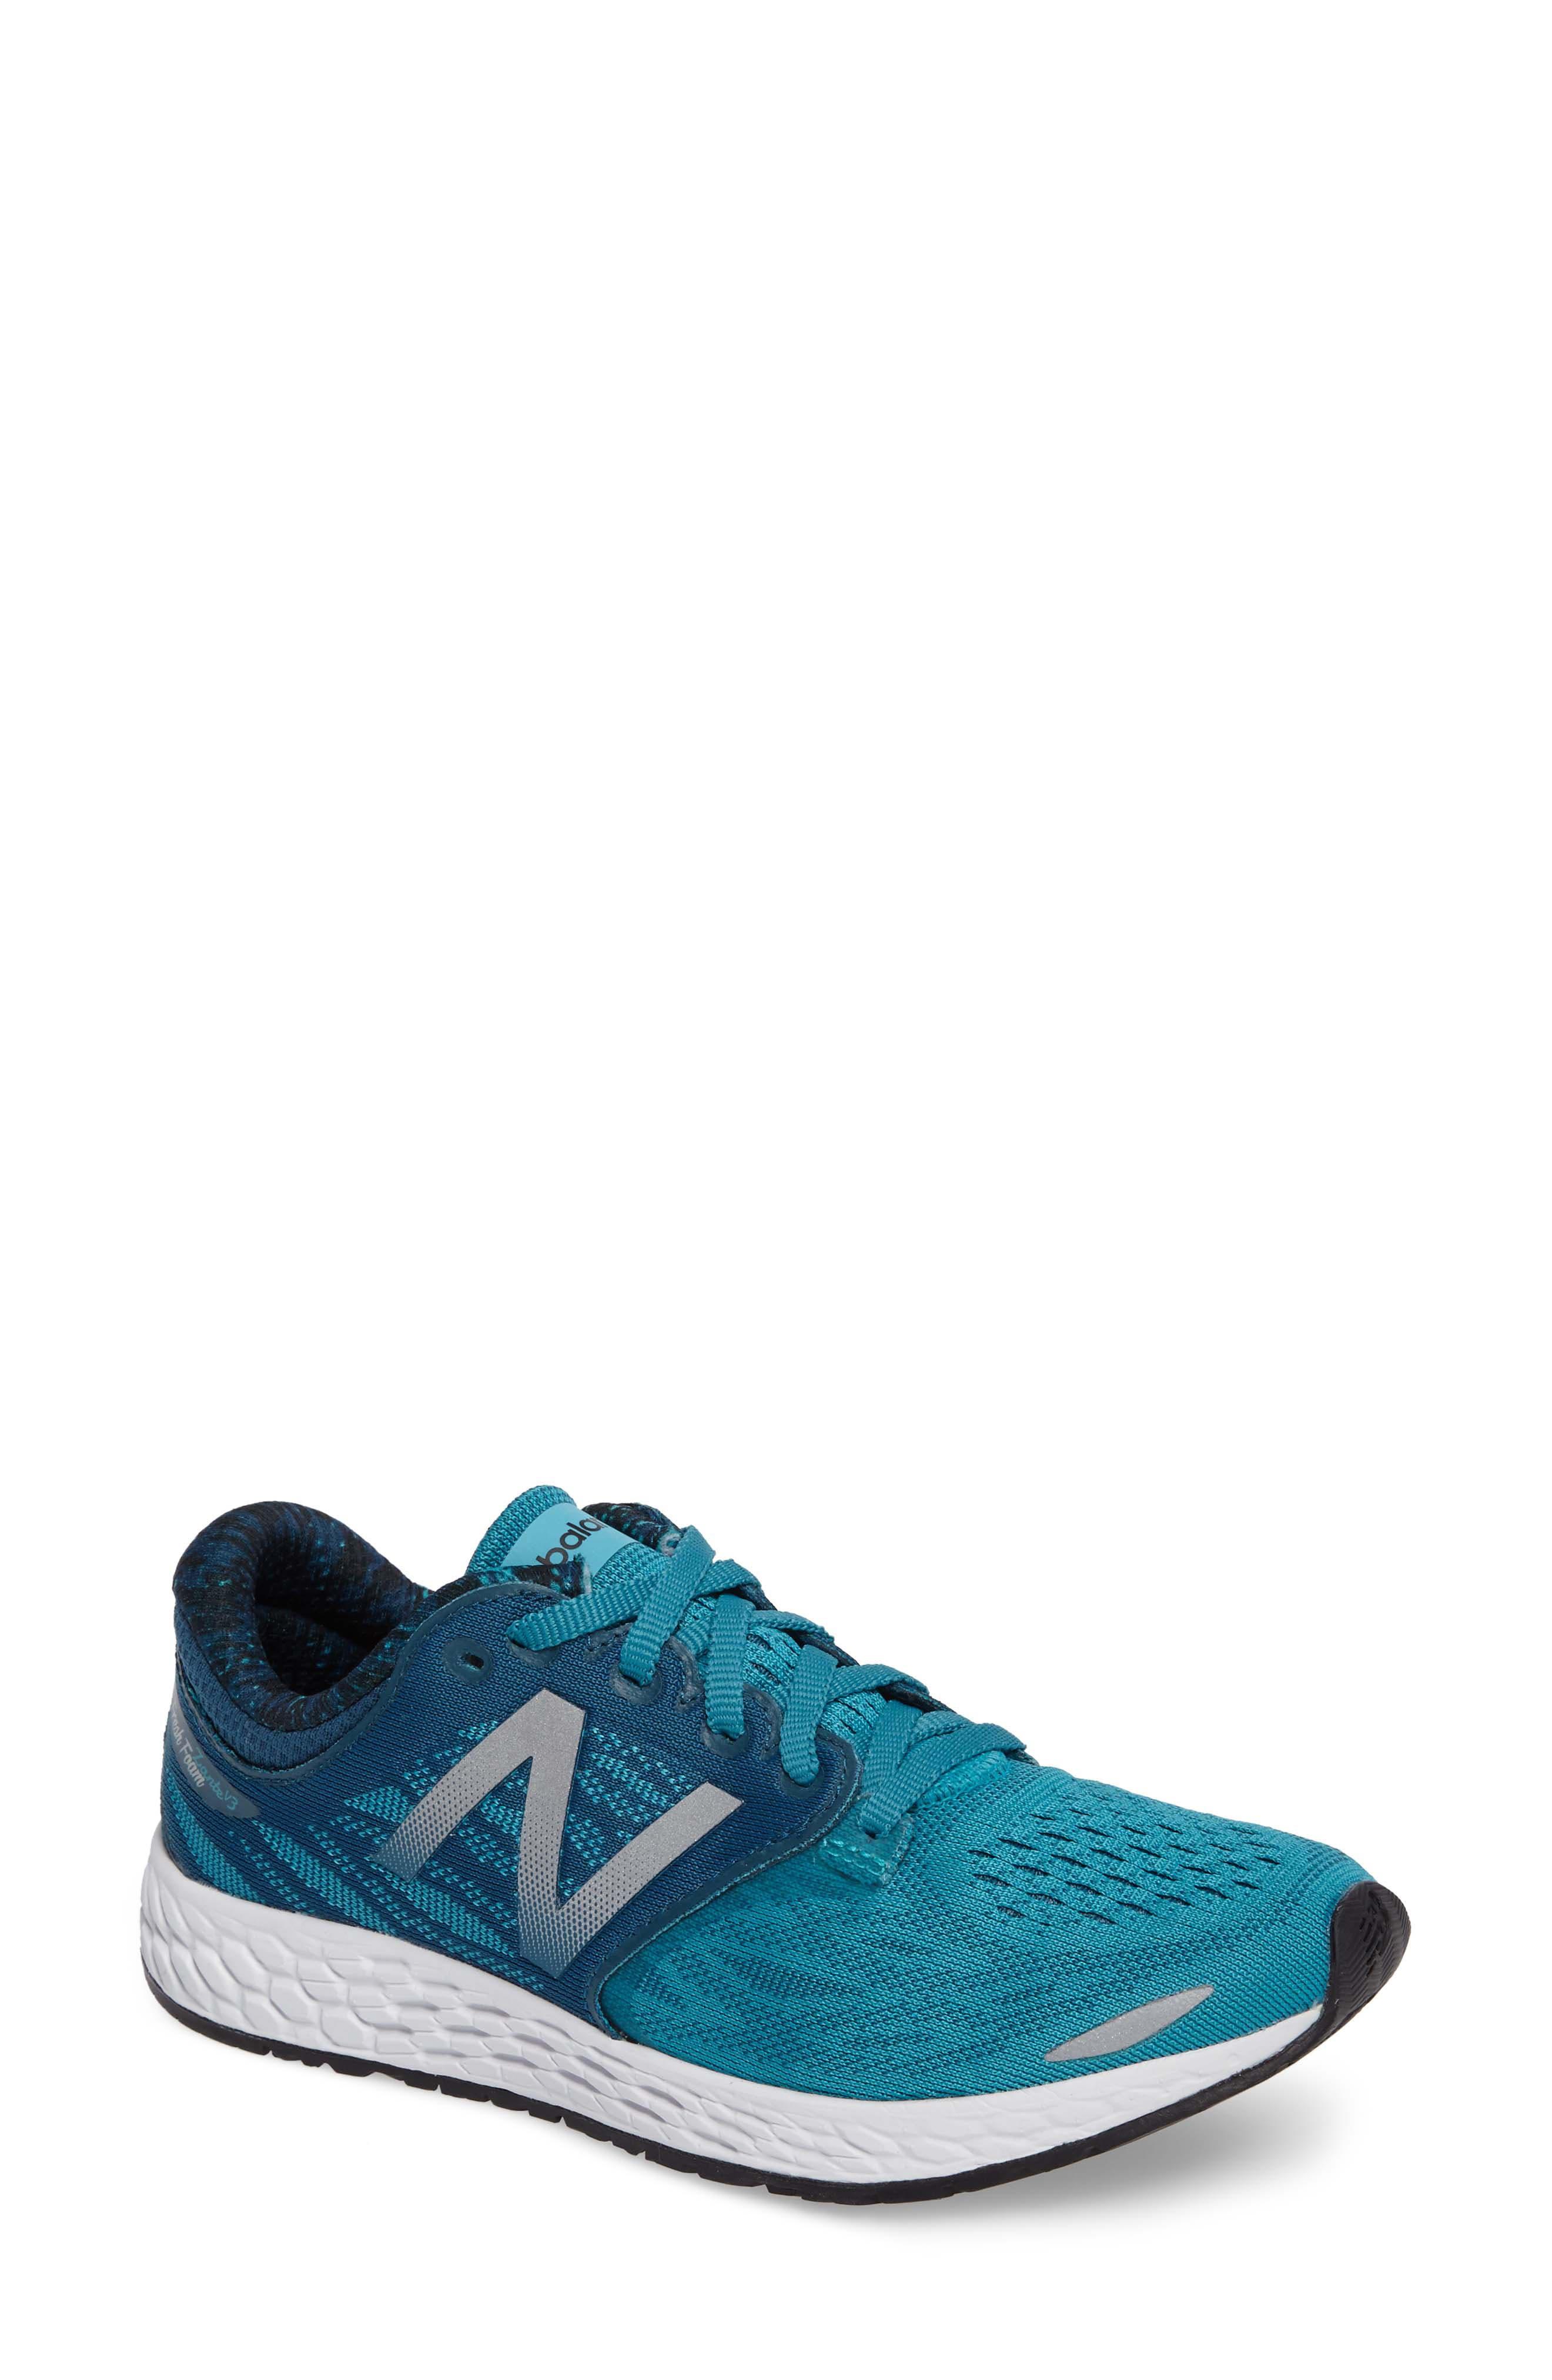 Zante V3 Running Shoe,                         Main,                         color, Pisces